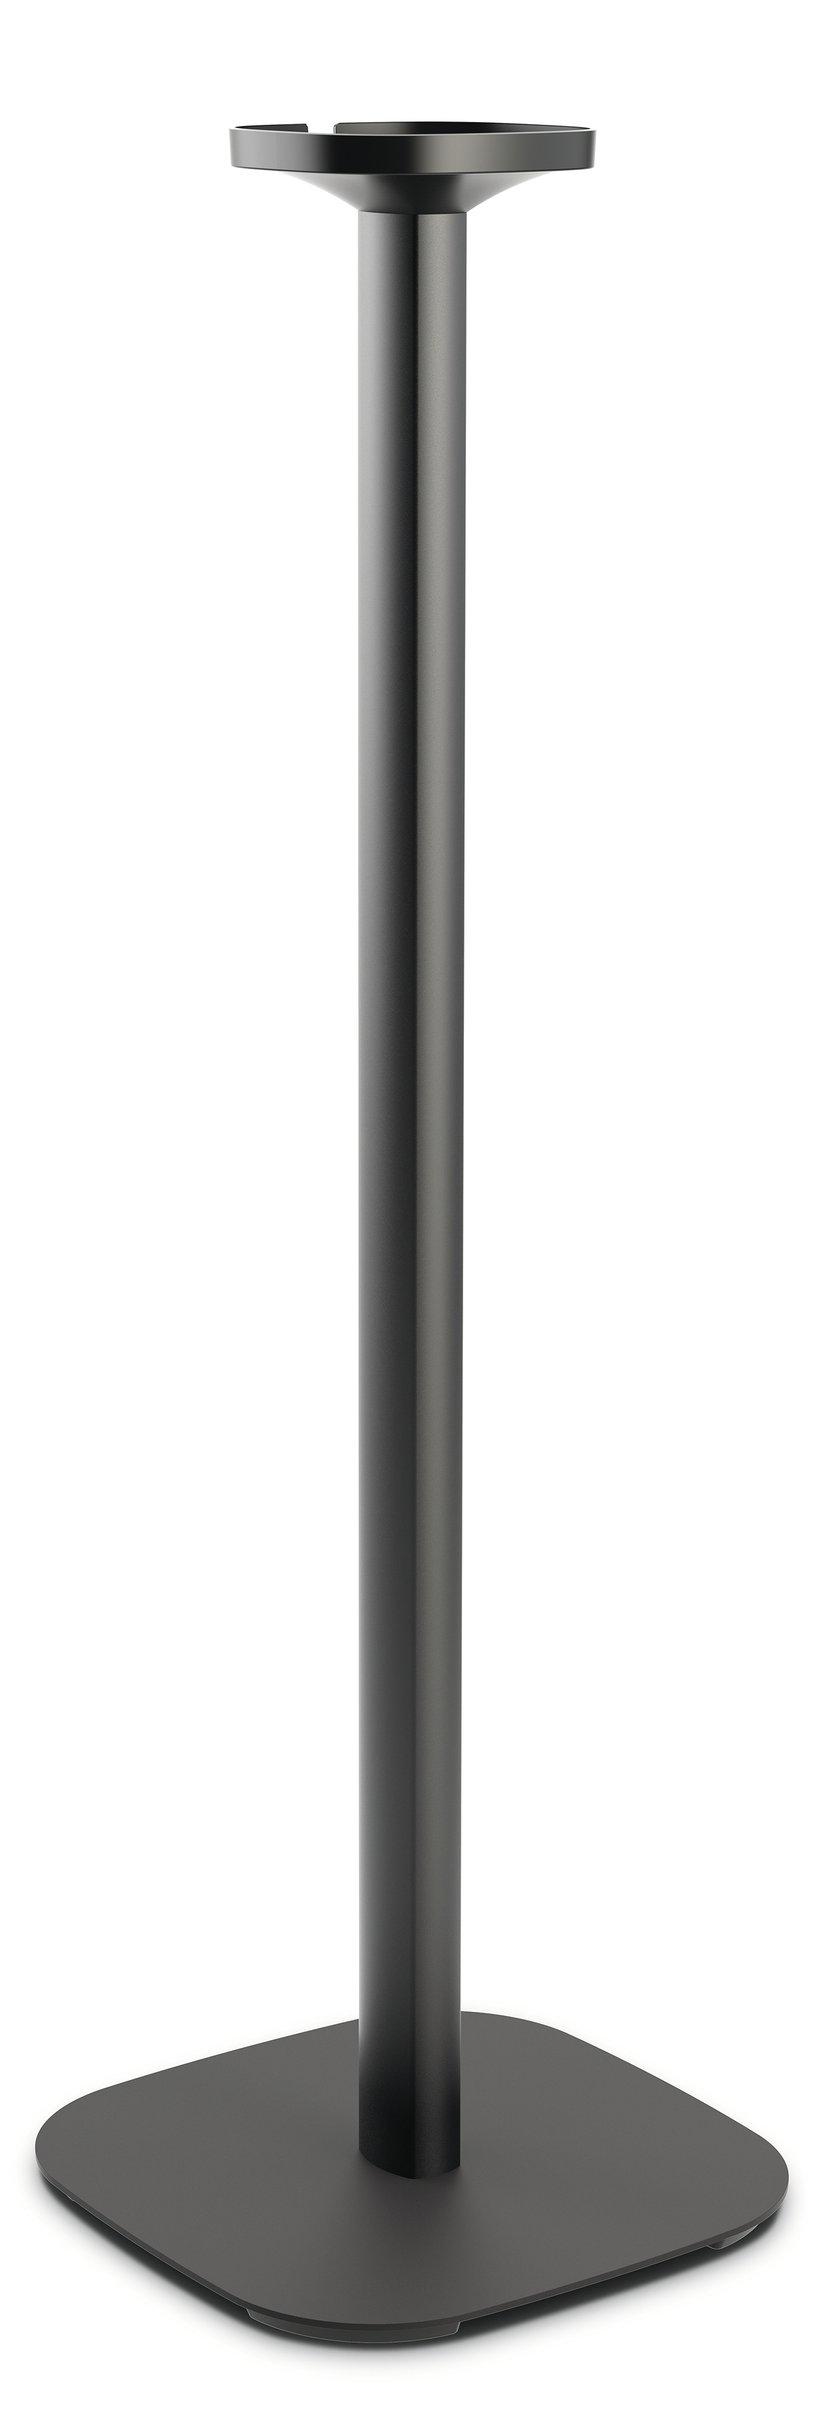 Vogel´s Sound 4301 Floor Stand Sonos One / Play:1